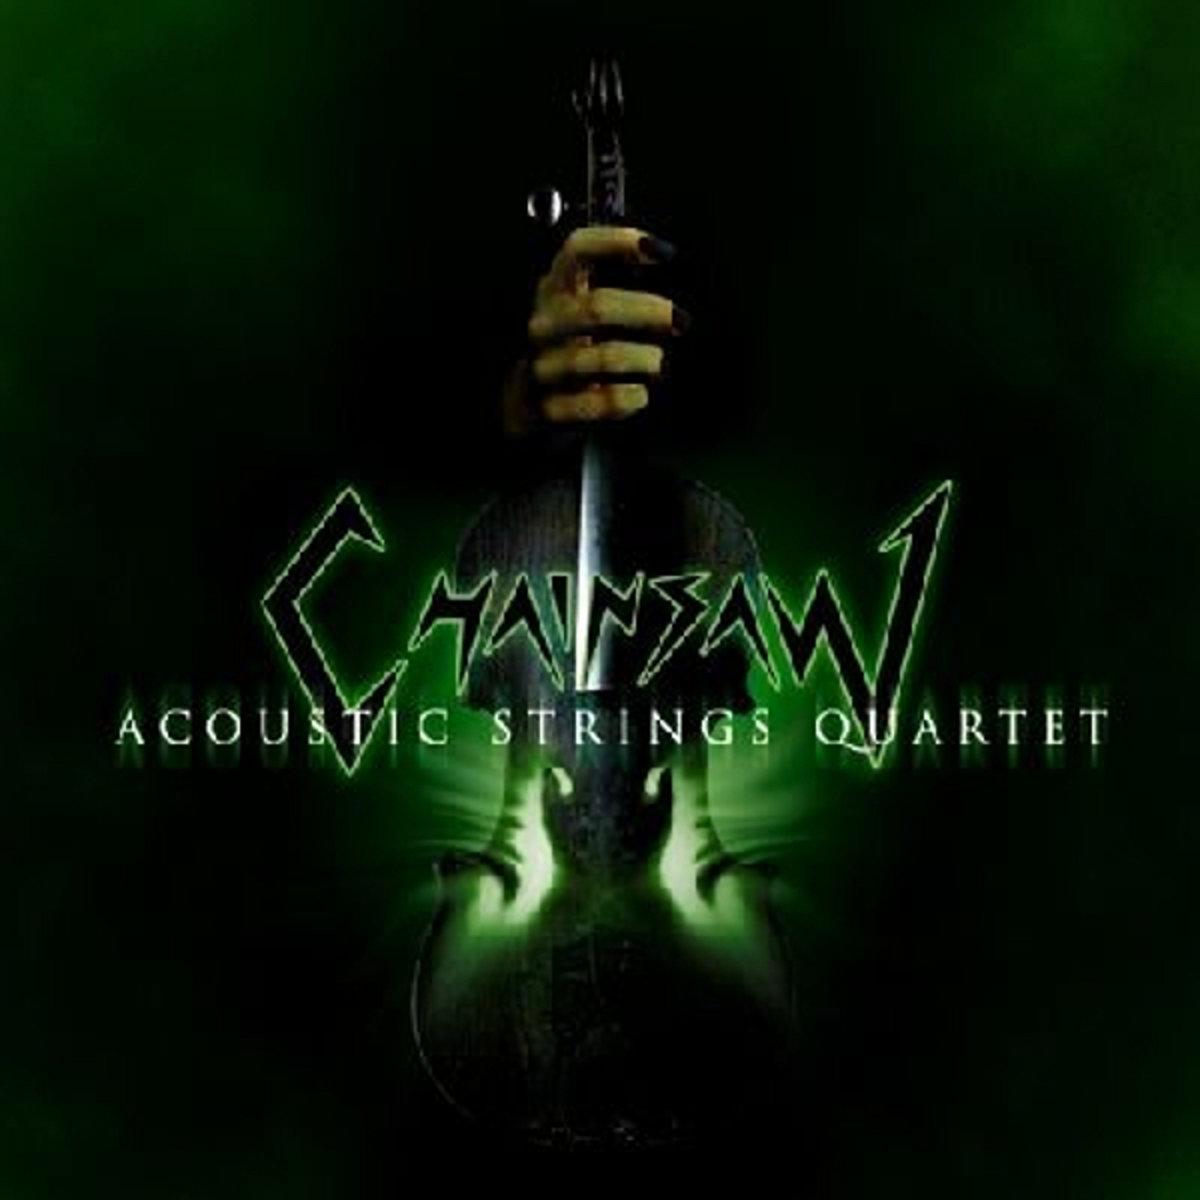 Chainsaw - Acoustic Strings Quartet